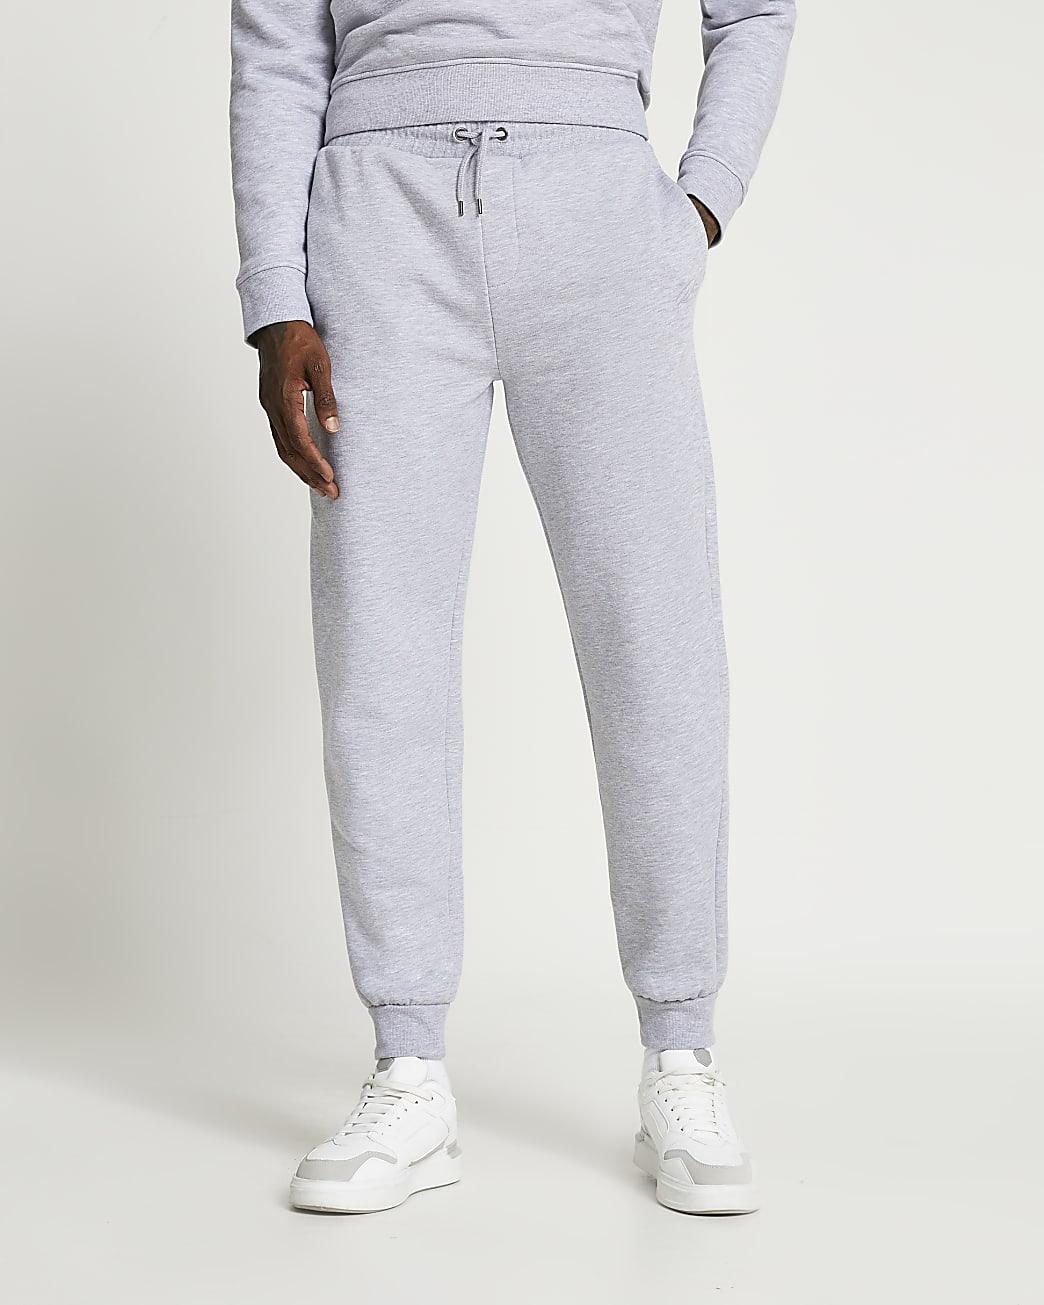 Grey RI branded slim fit tapered joggers